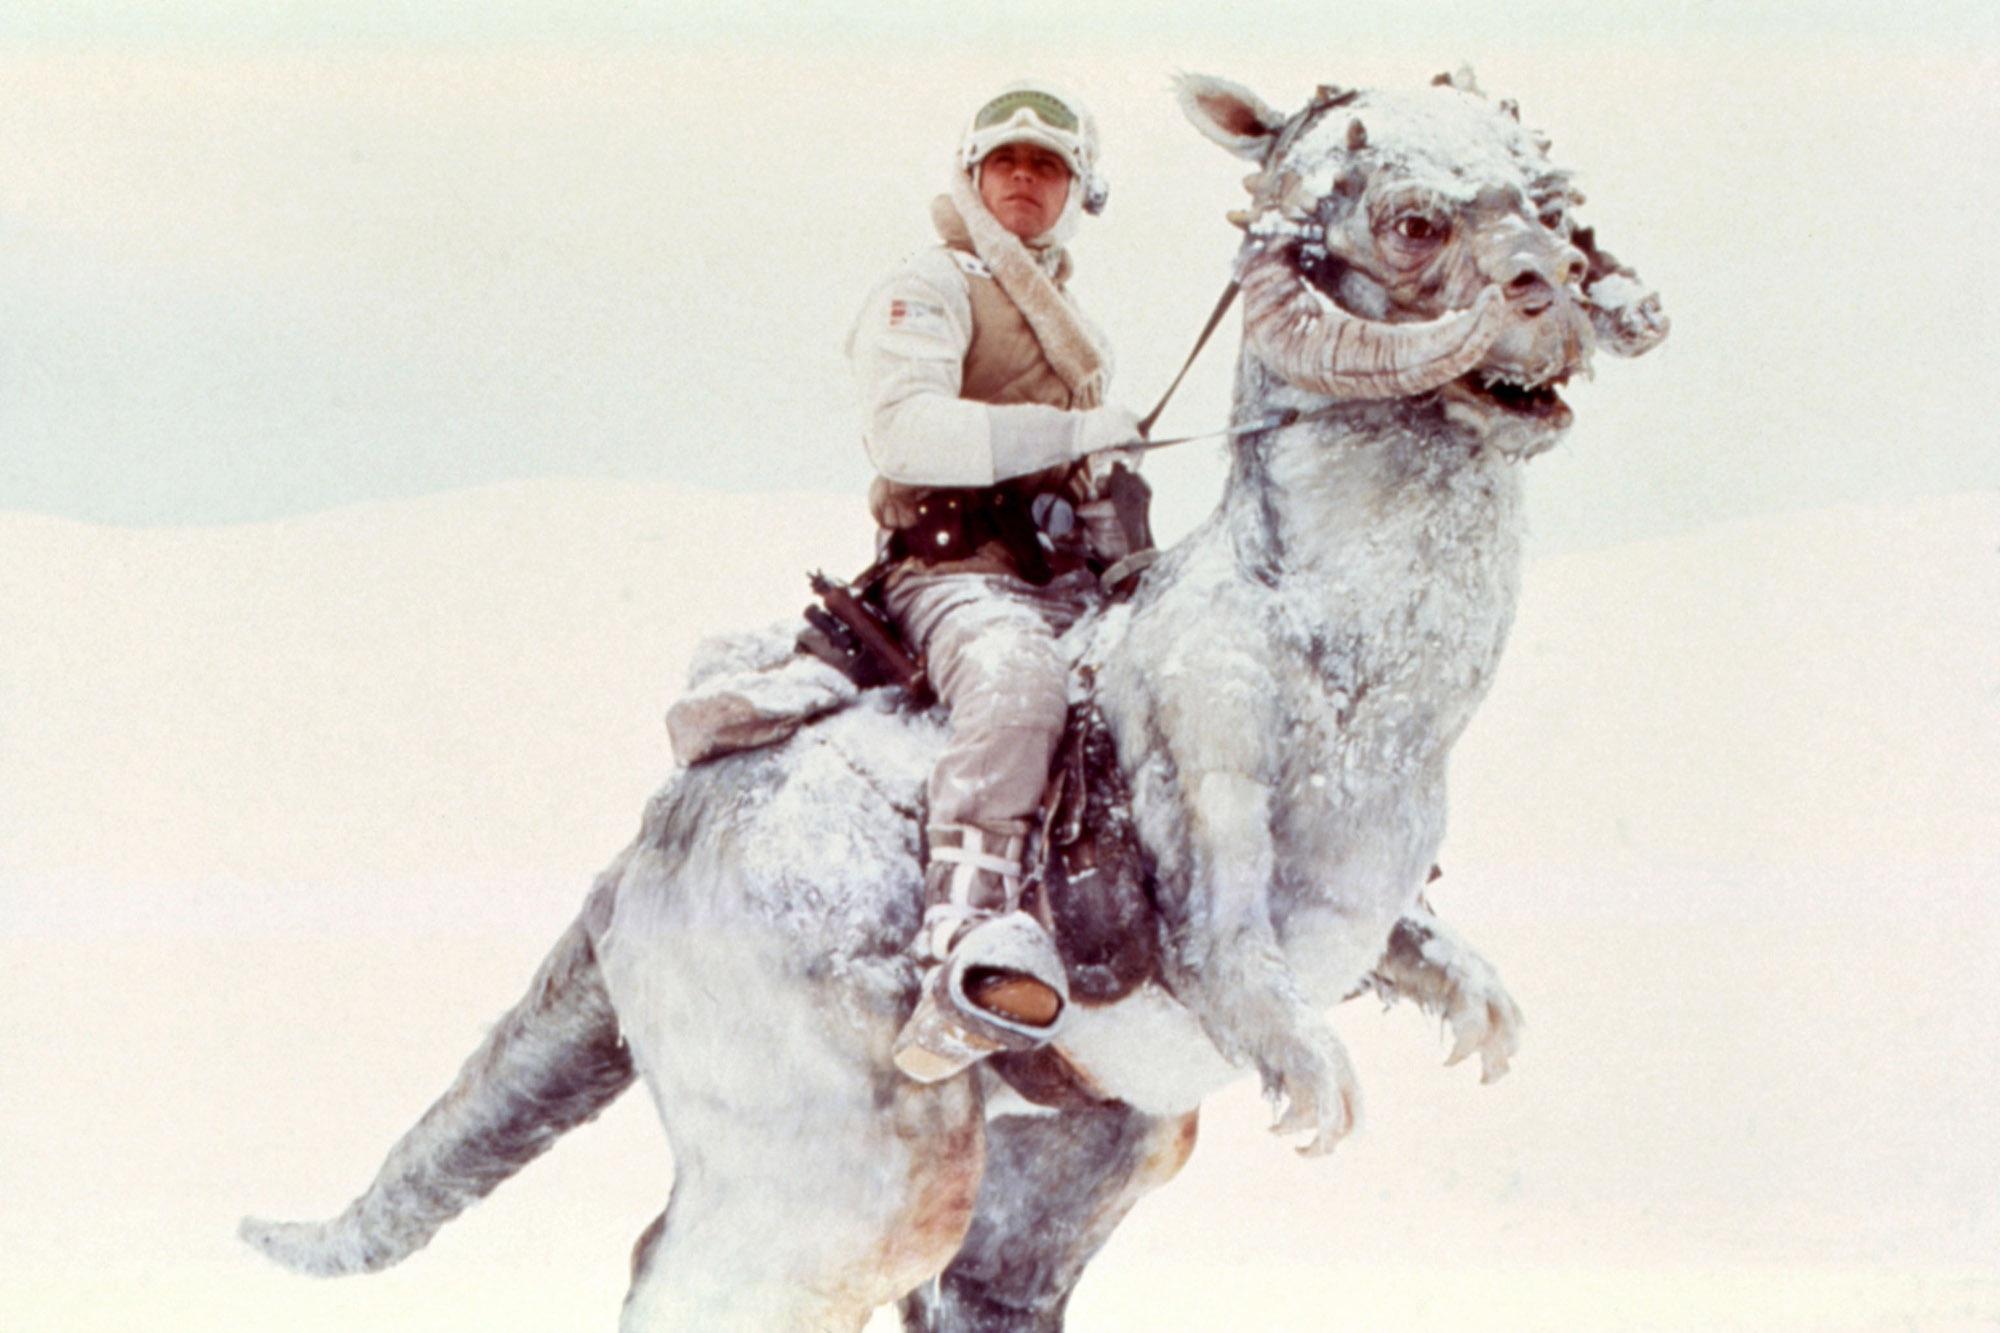 1981: The Empire Strikes Back